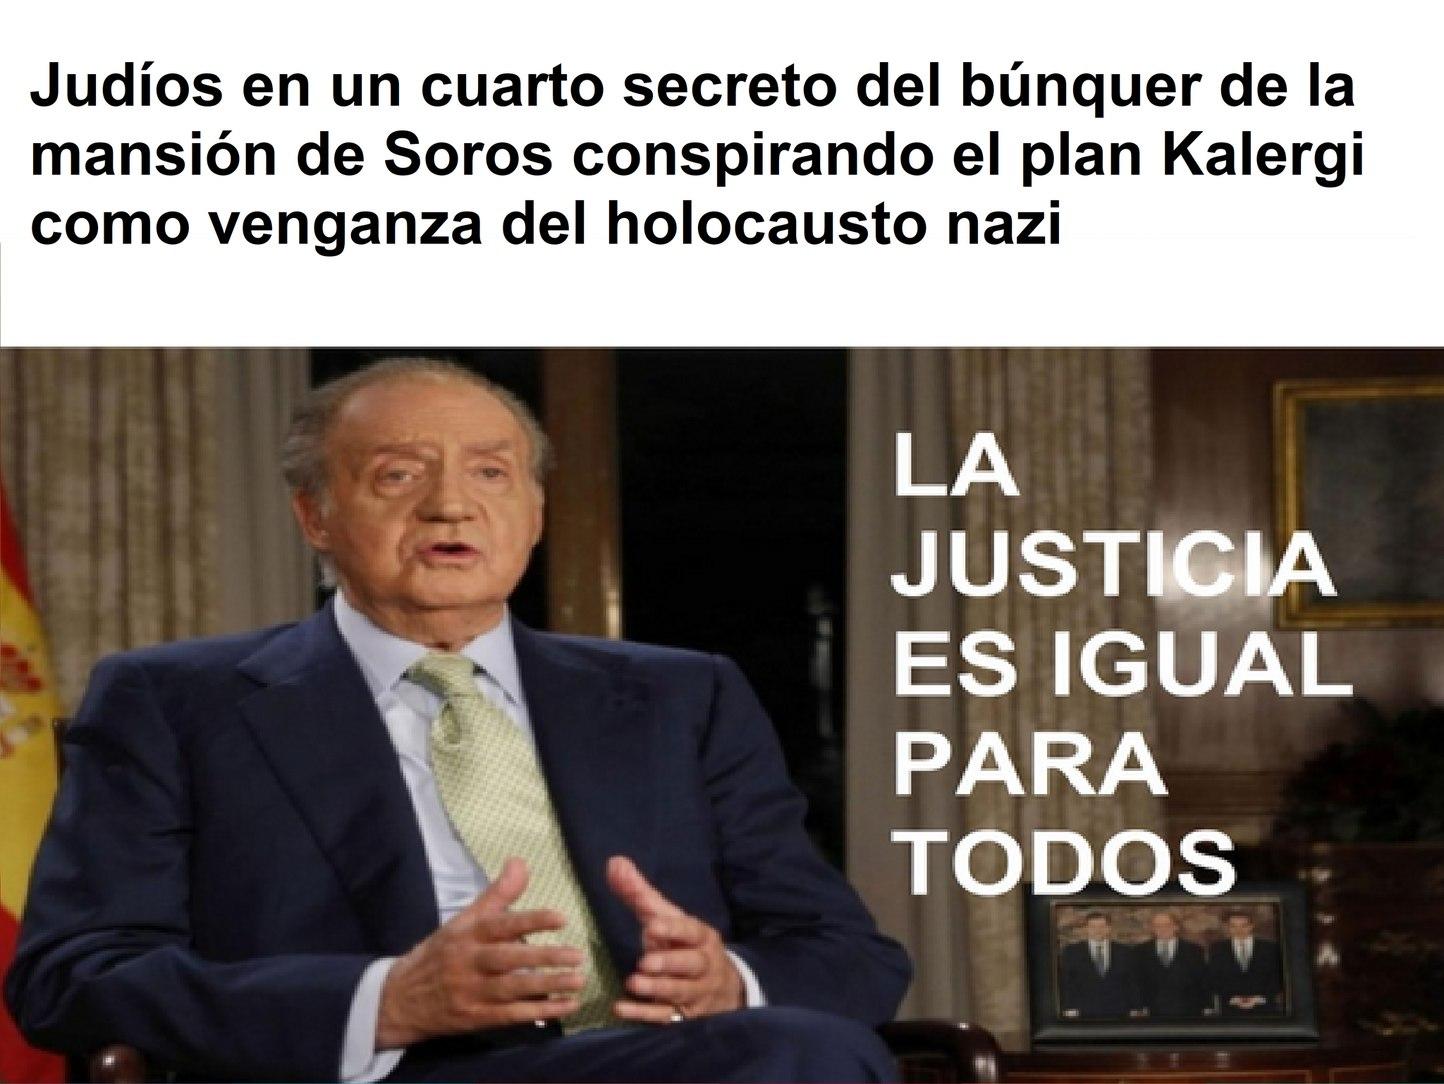 EL TITULO TE ESPIA - meme